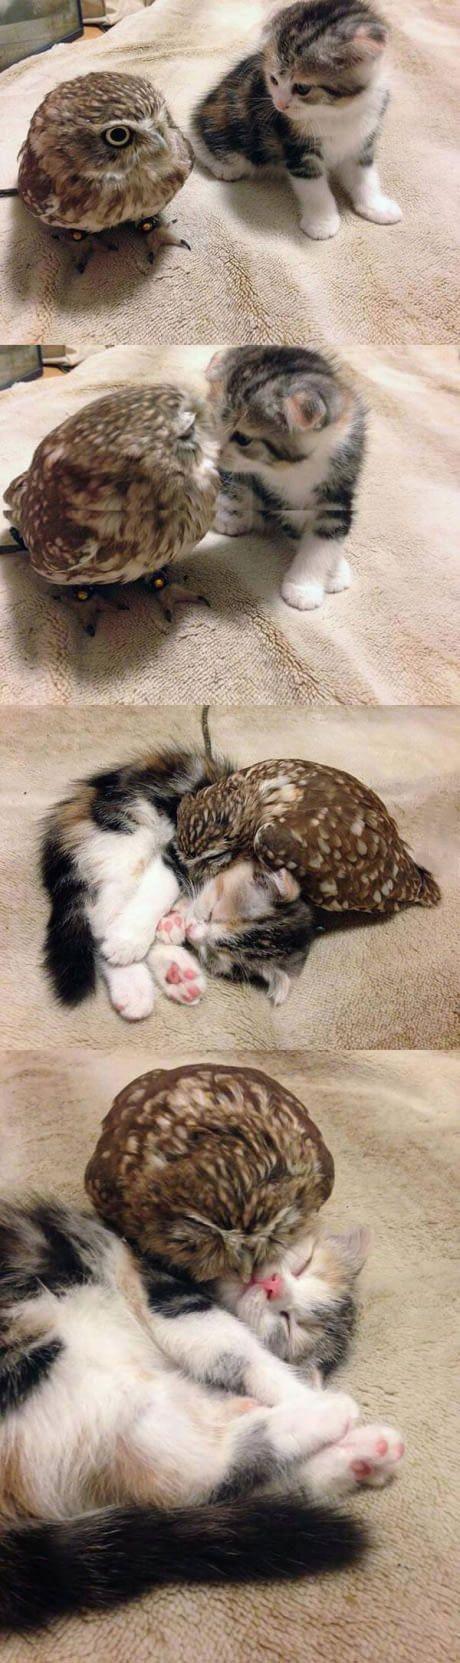 Baby owl & cat